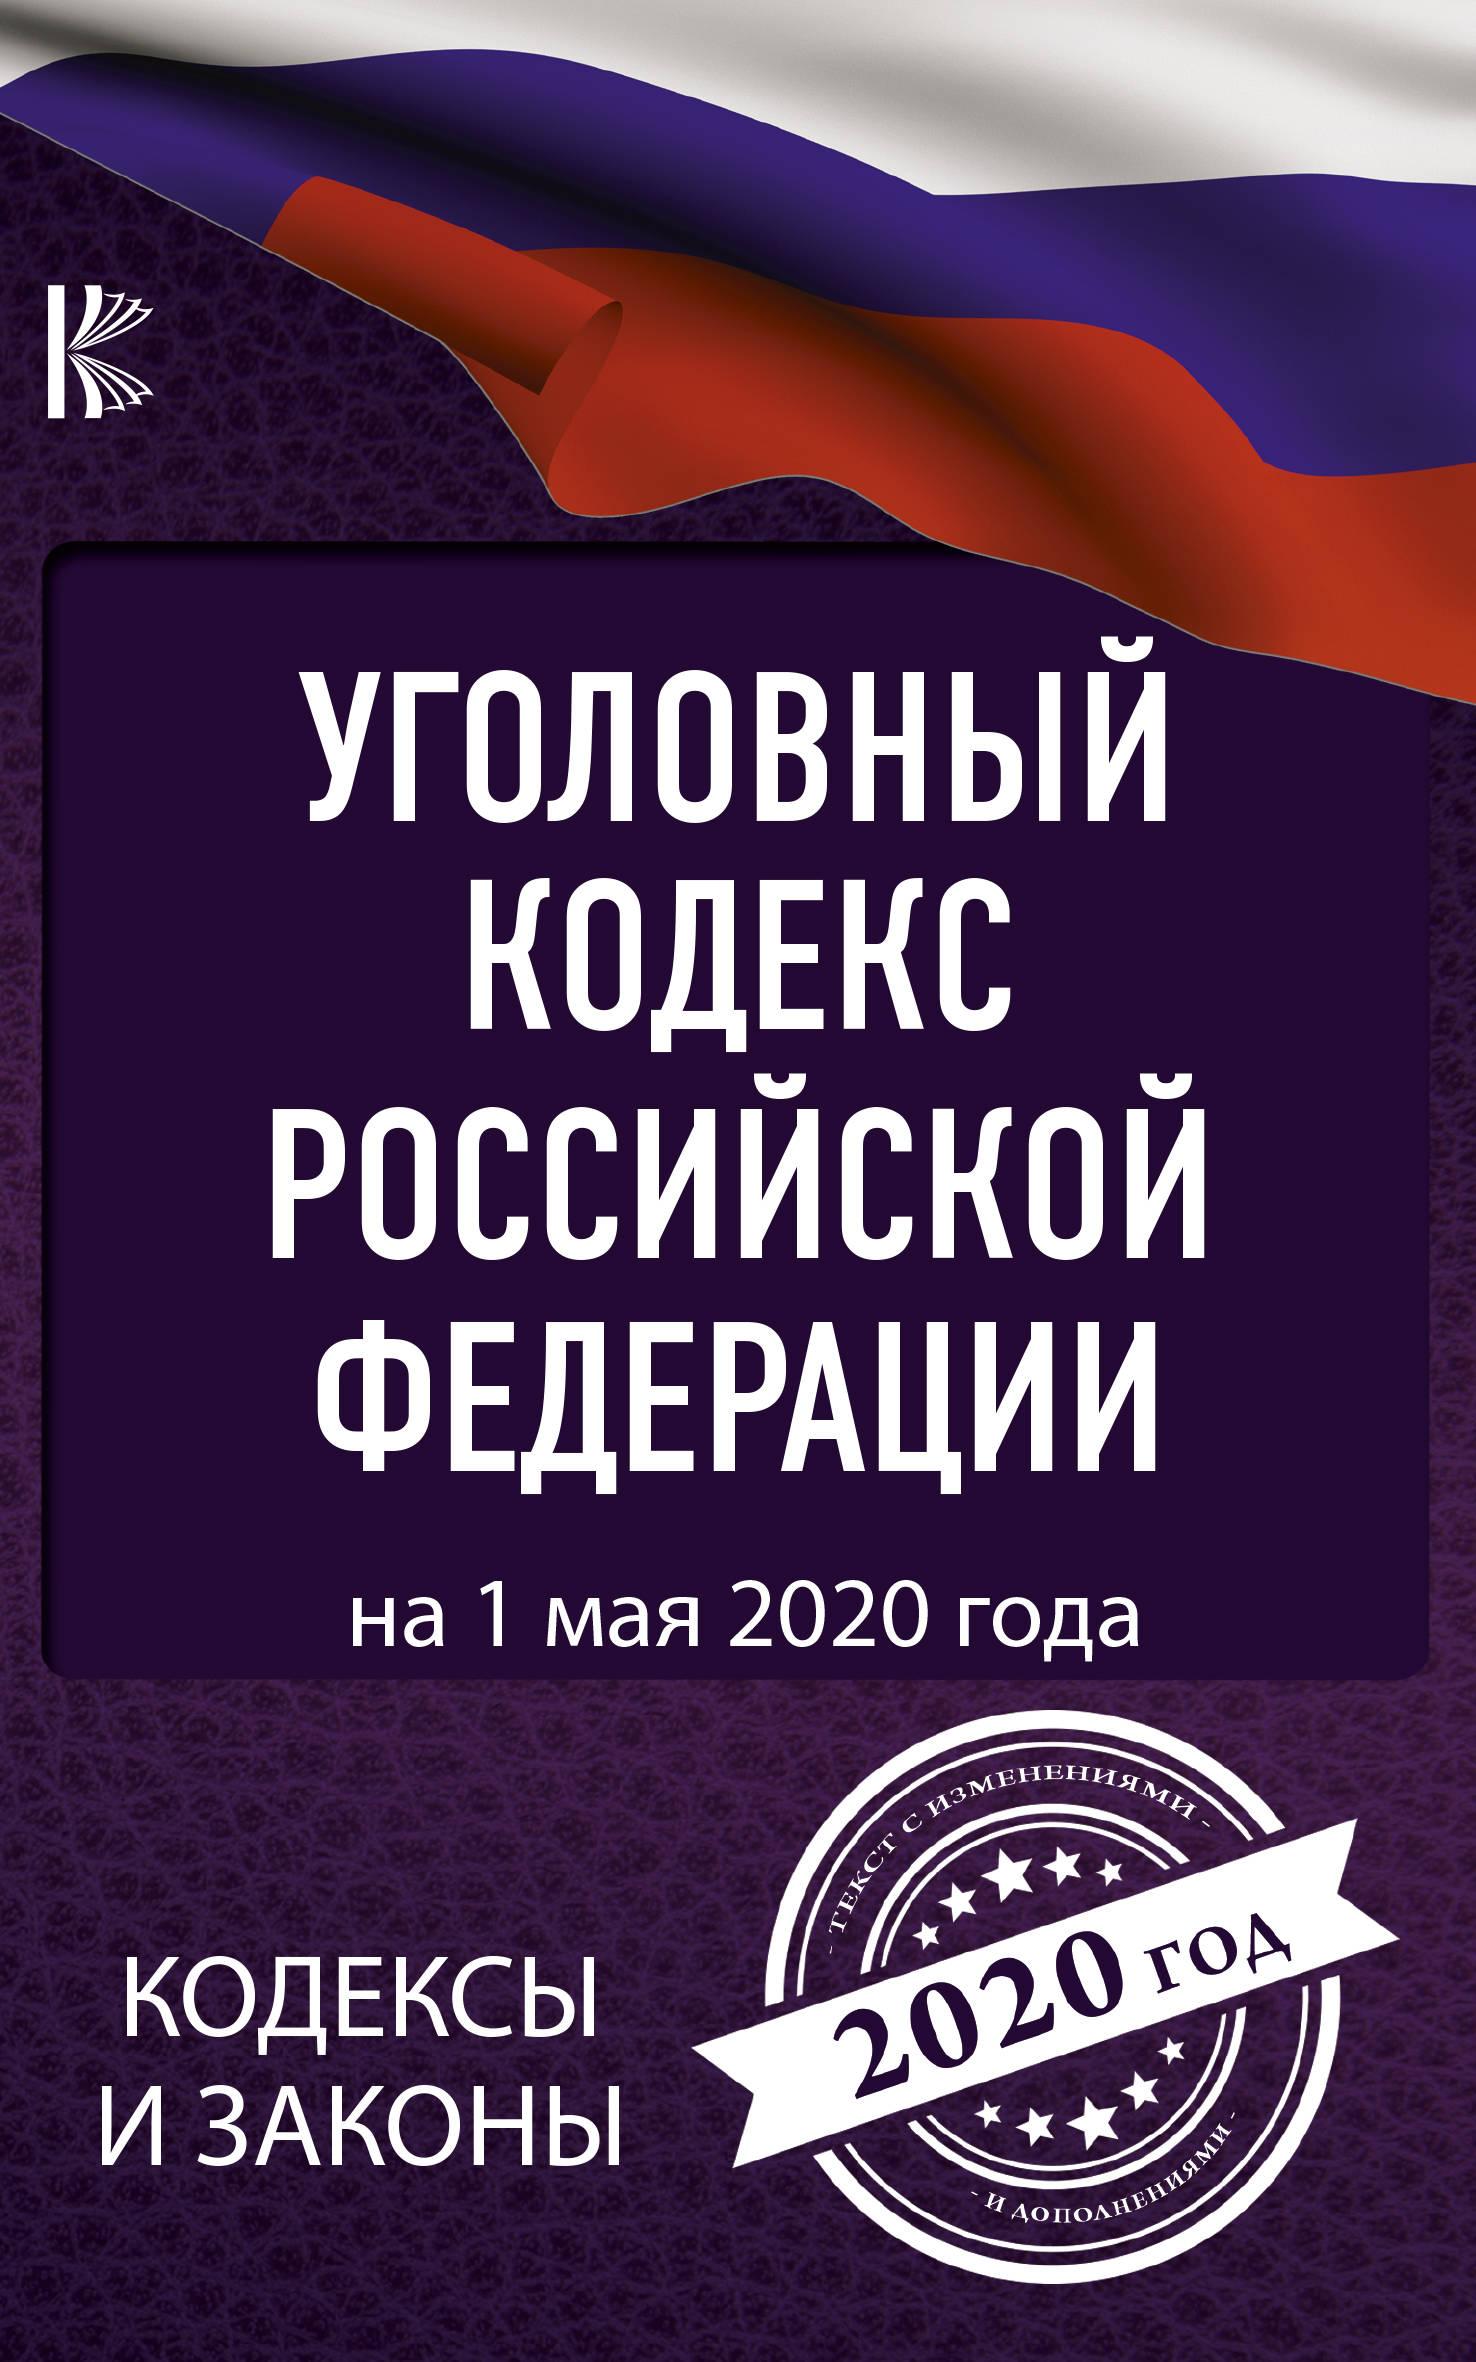 Ugolovnyj Kodeks Rossijskoj Federatsii na 1 maja 2020 goda